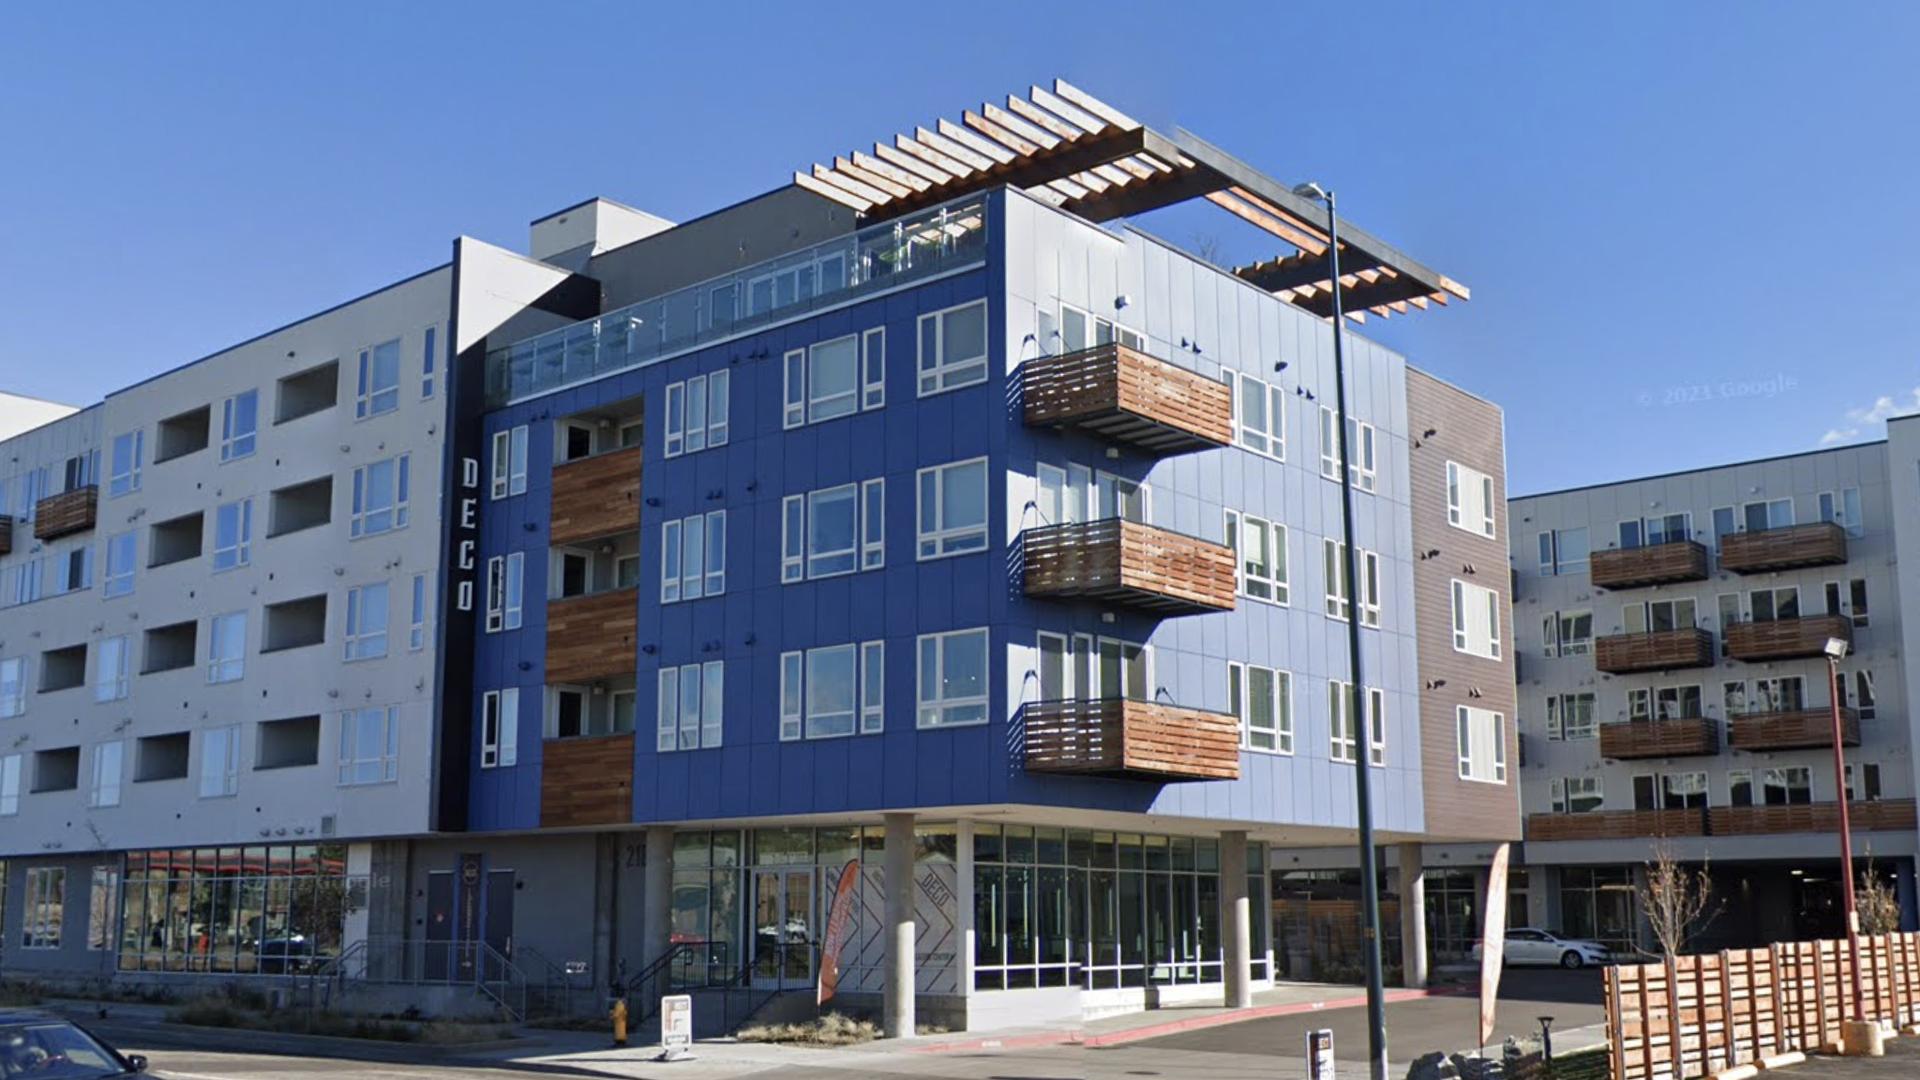 Deco Apartments, Image: © 2021 Google/Google Street View